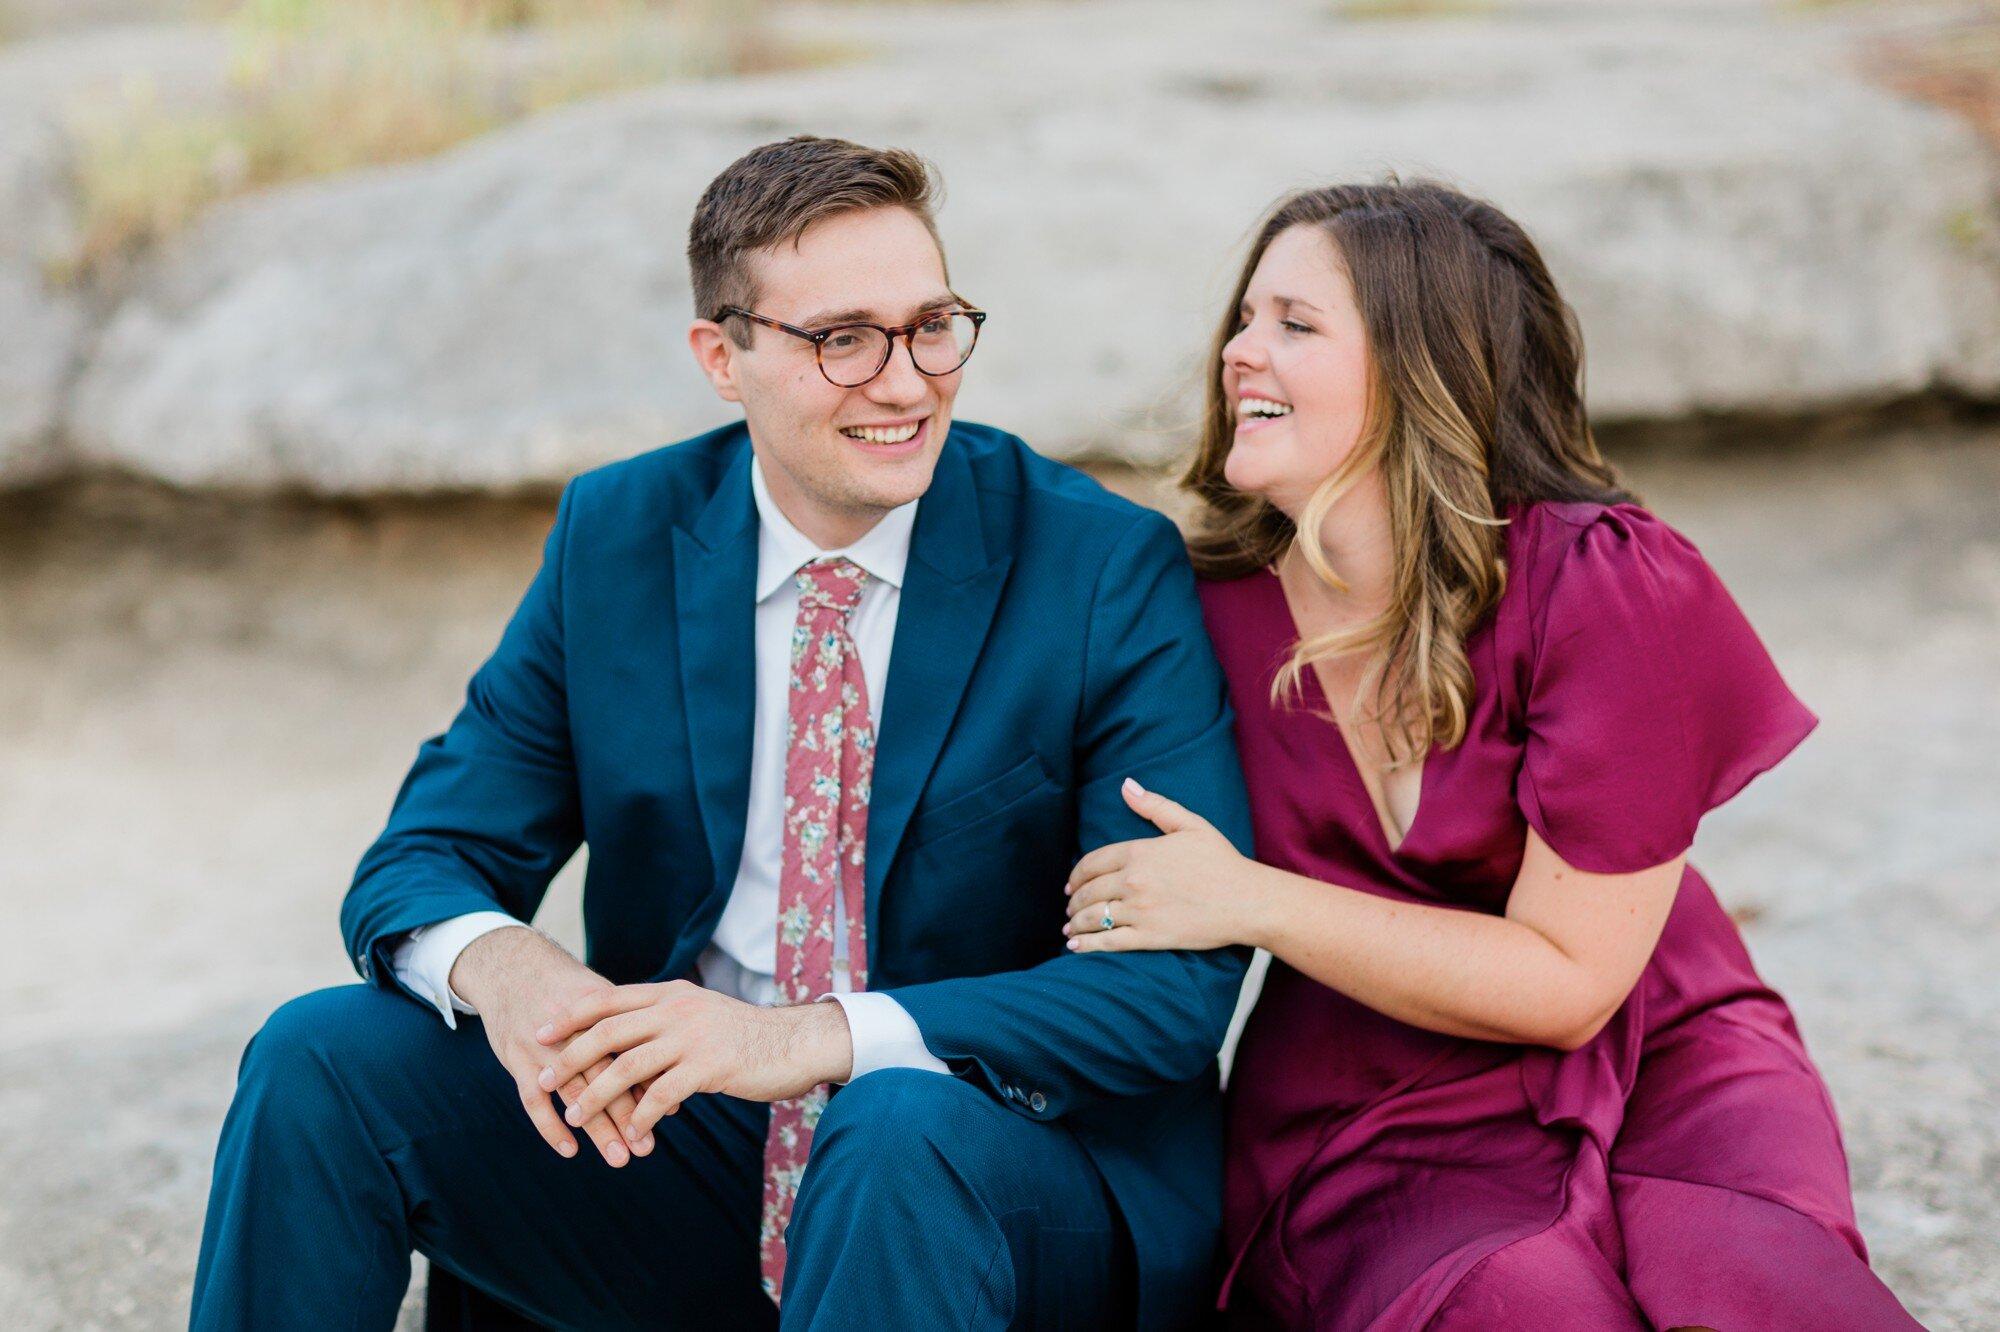 bull creek park austin texas engagement photo, burgundy dress and suit